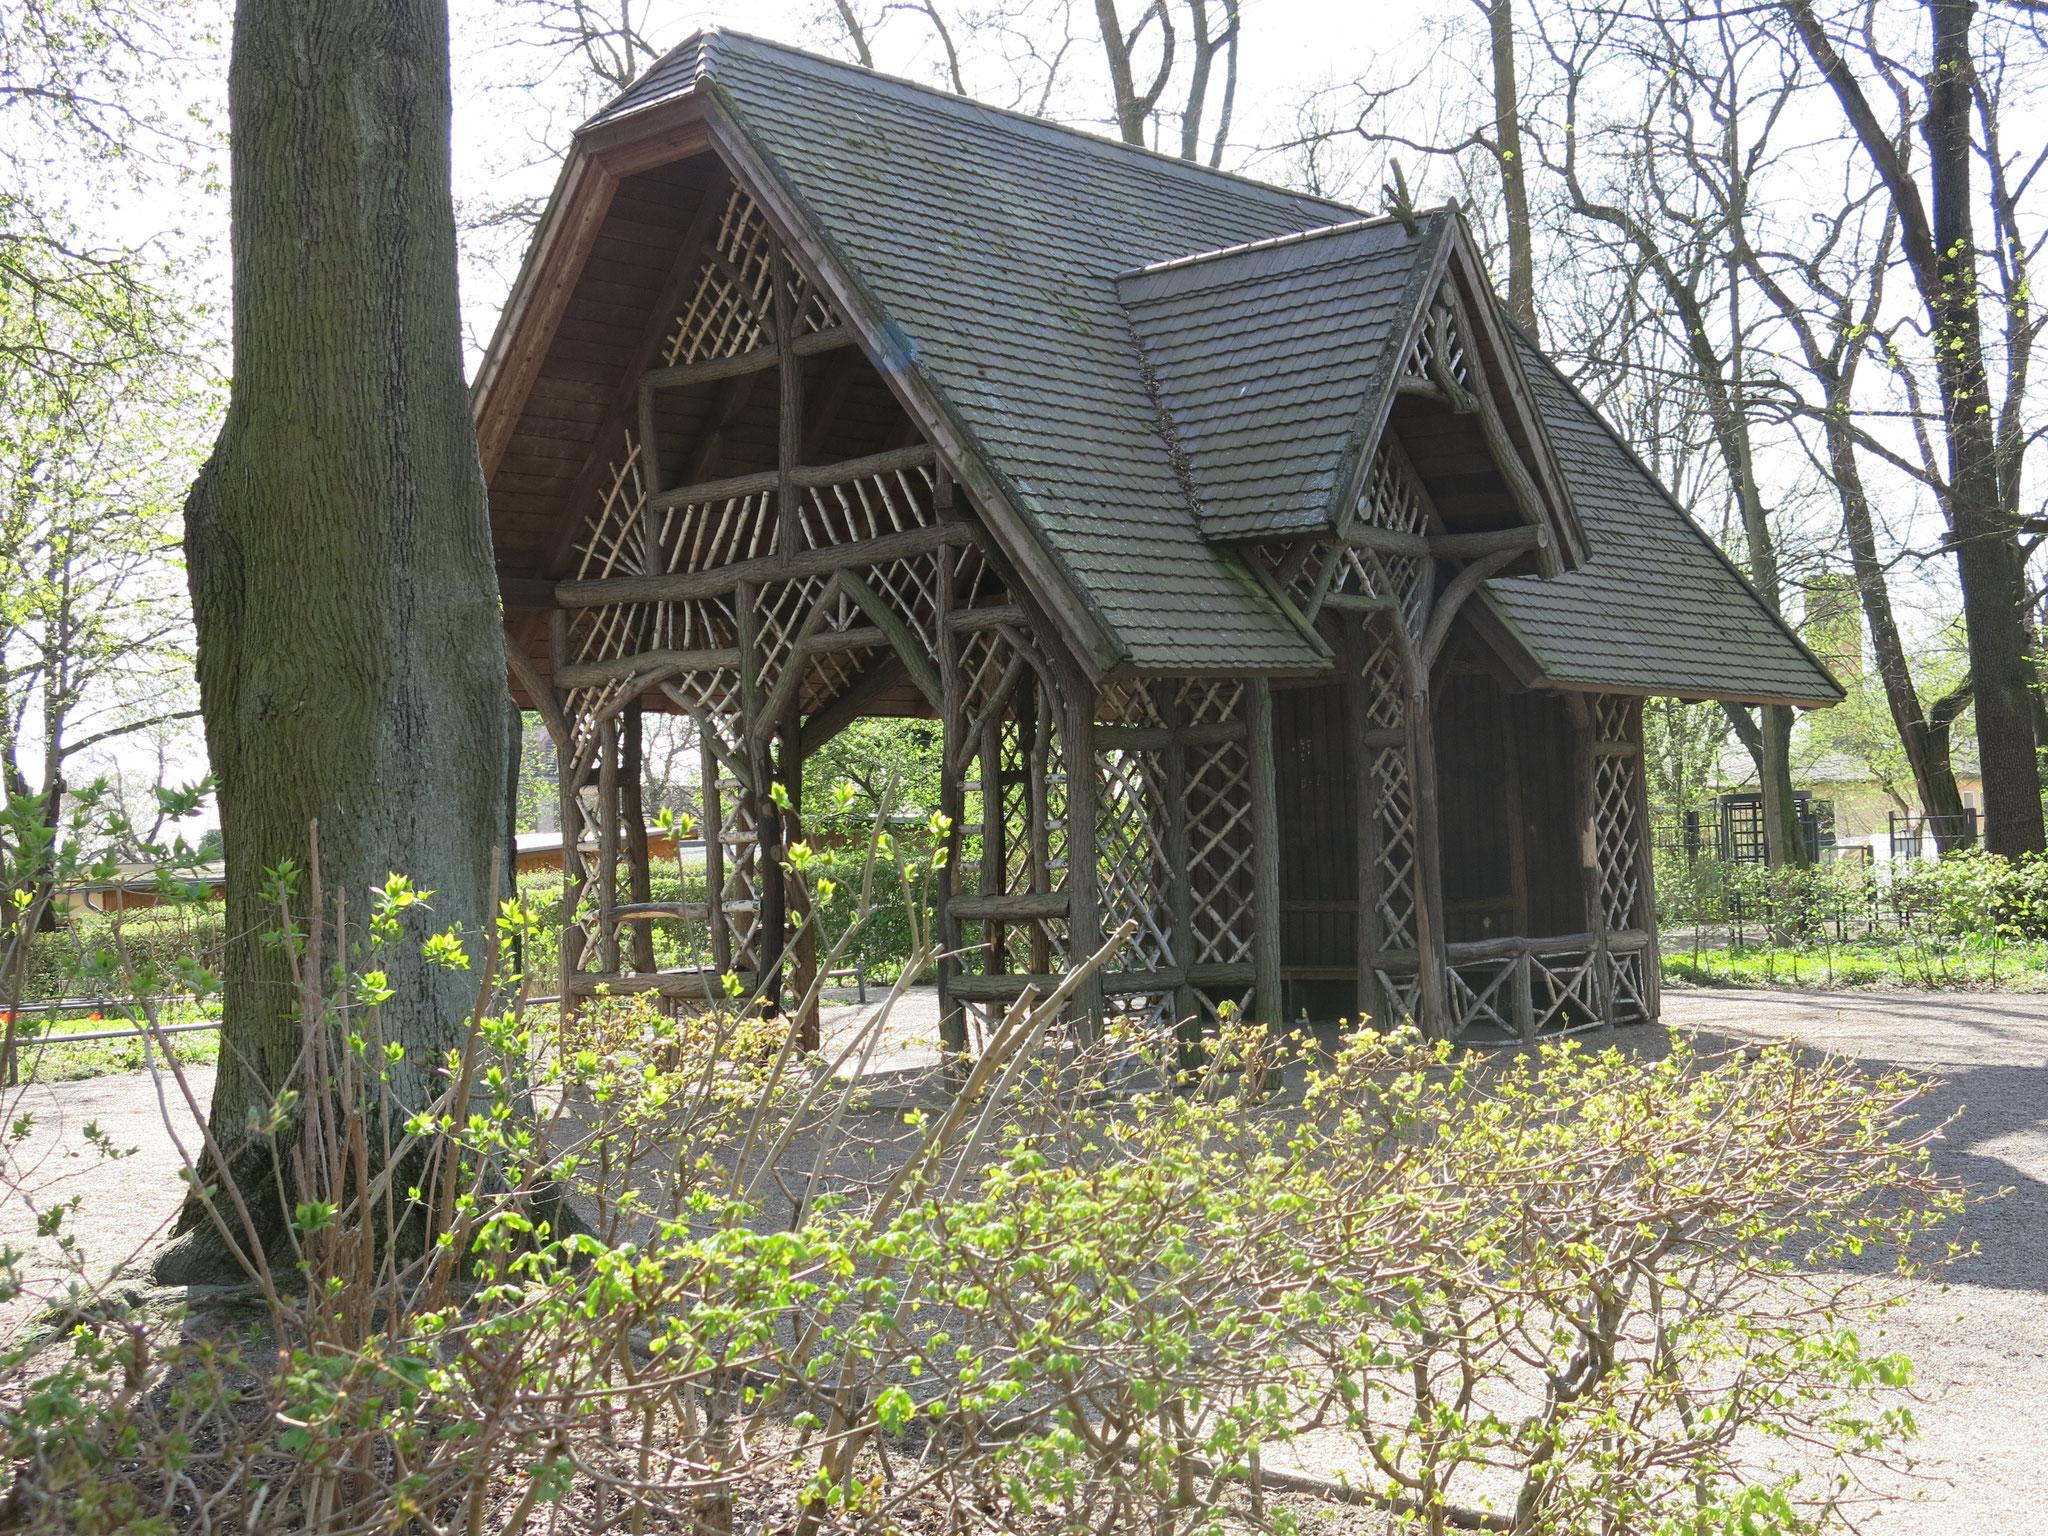 Tipp 4: Schlosspark Biesdorf, Teepavillon aus Robinien- und Birkenholz